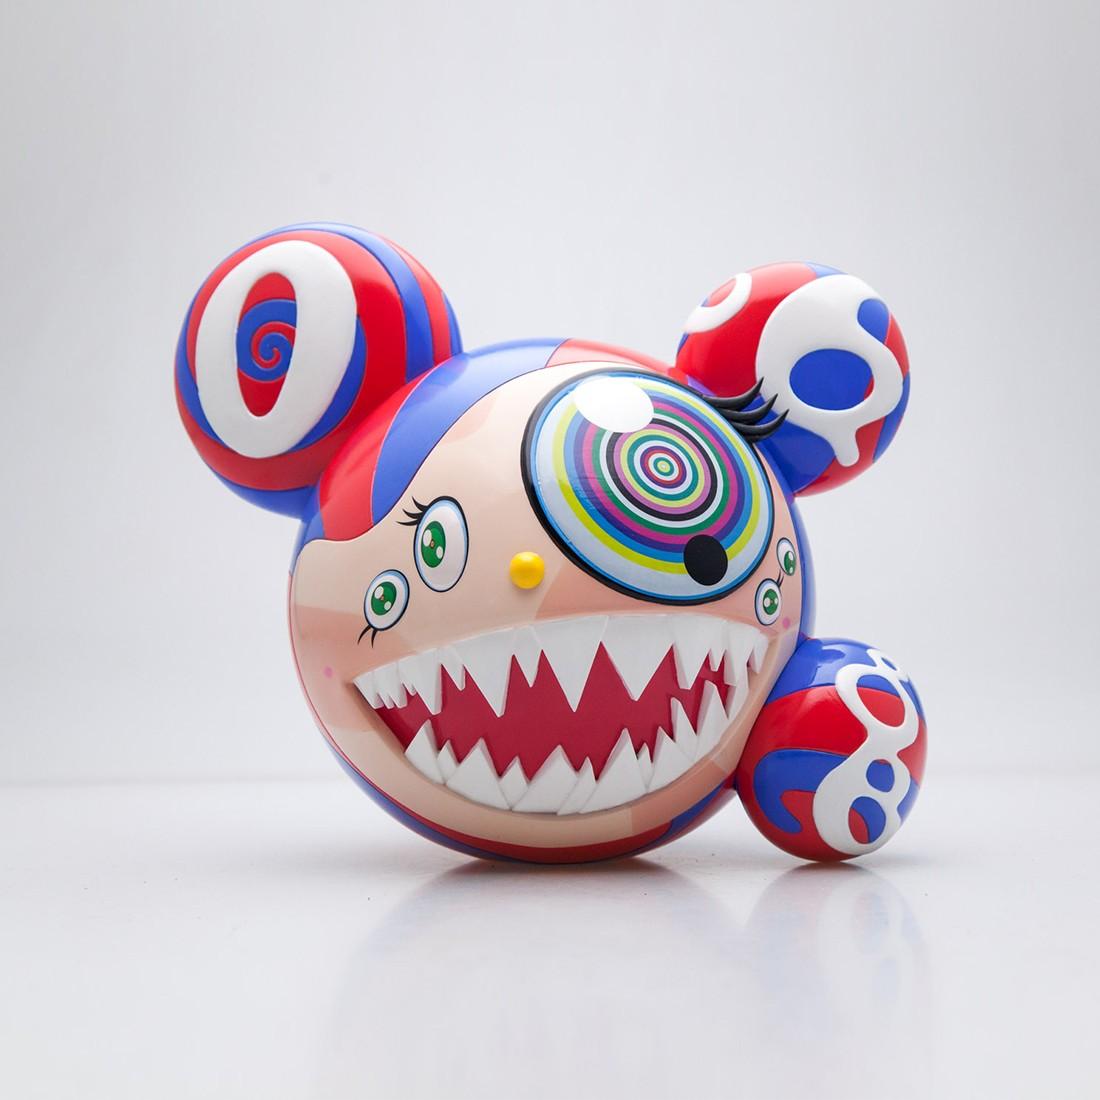 Takashi Murakami - Mr. Dob Figure.jpg